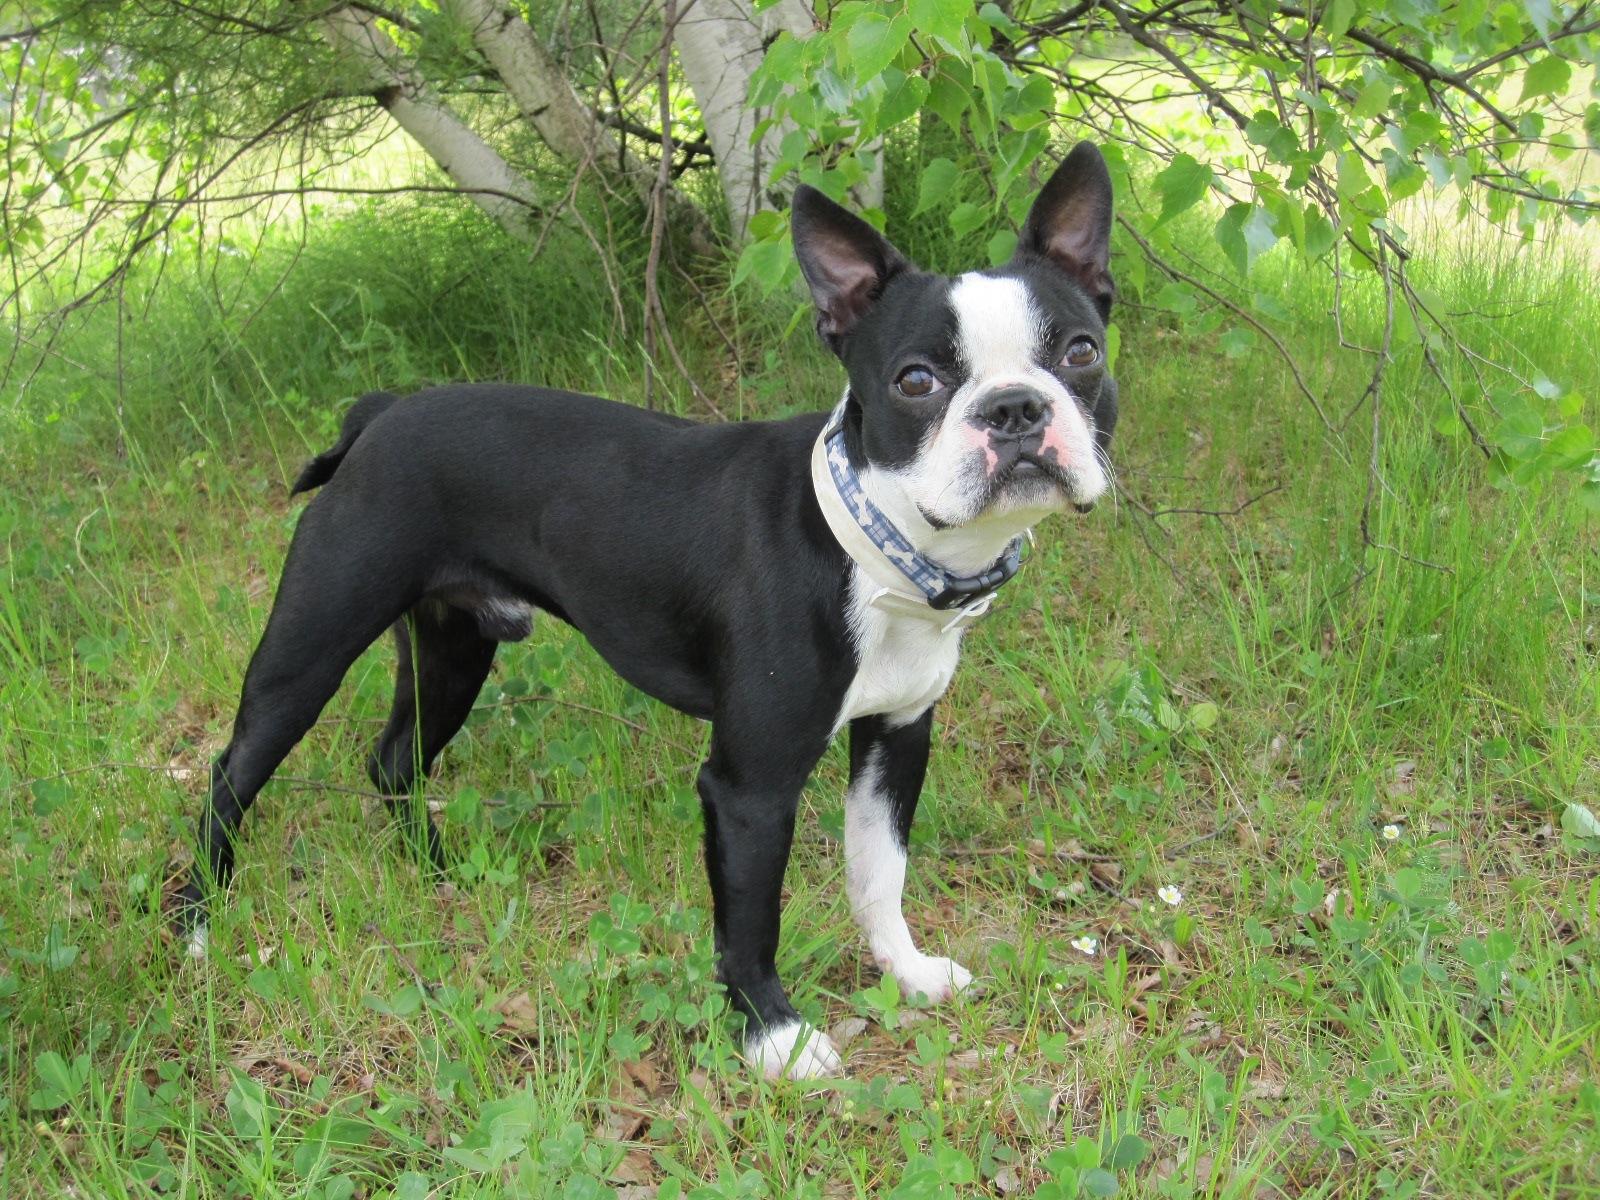 Boston Terrier Dog: Boston Baseball Dog Rocky The Boston Terrier Breed